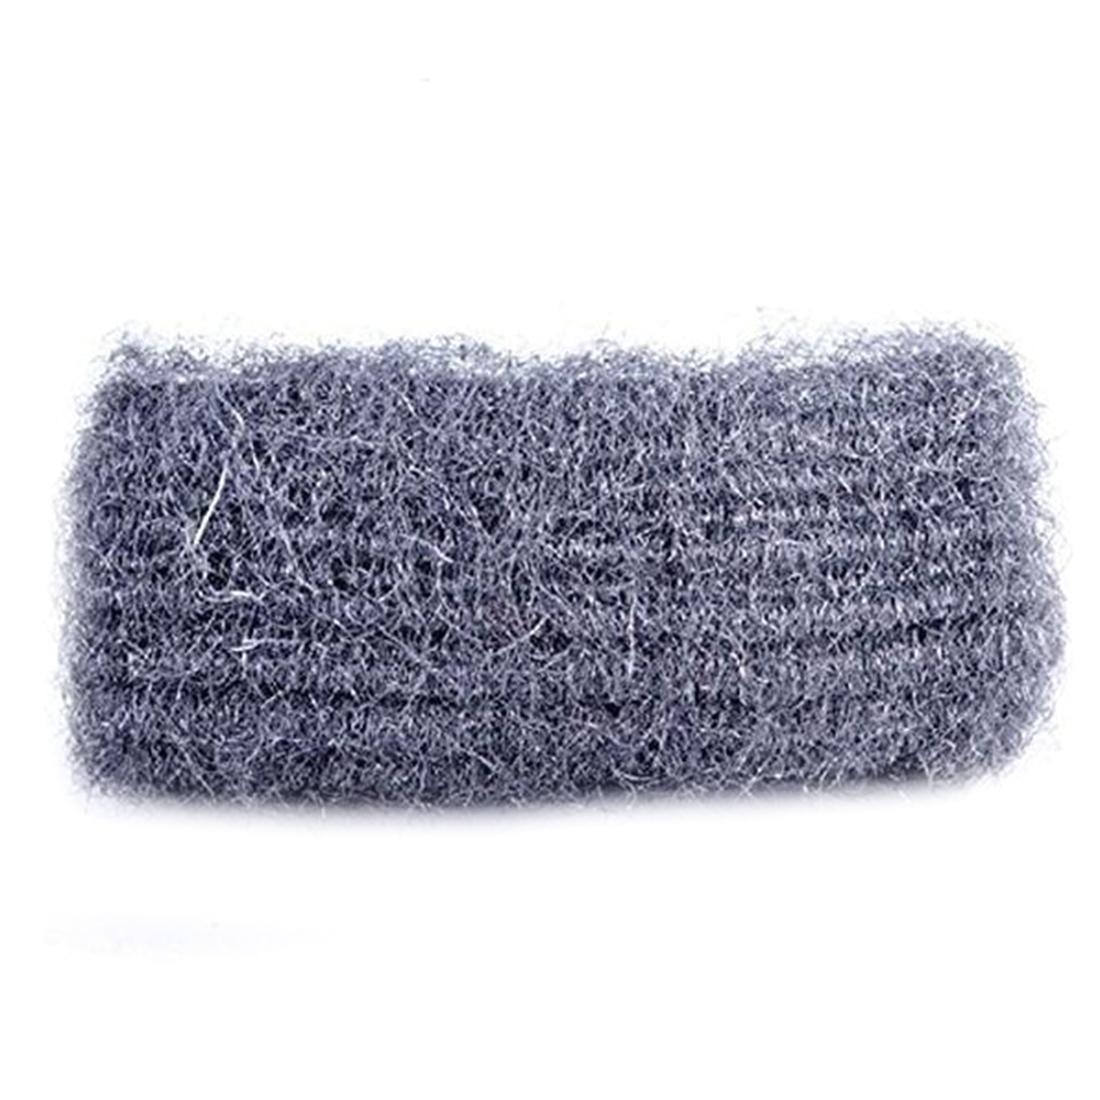 Wool Light Detergent Sponge Metal Mesh Super Detergent tool 12pcs Lot Kitchen Steel Wool